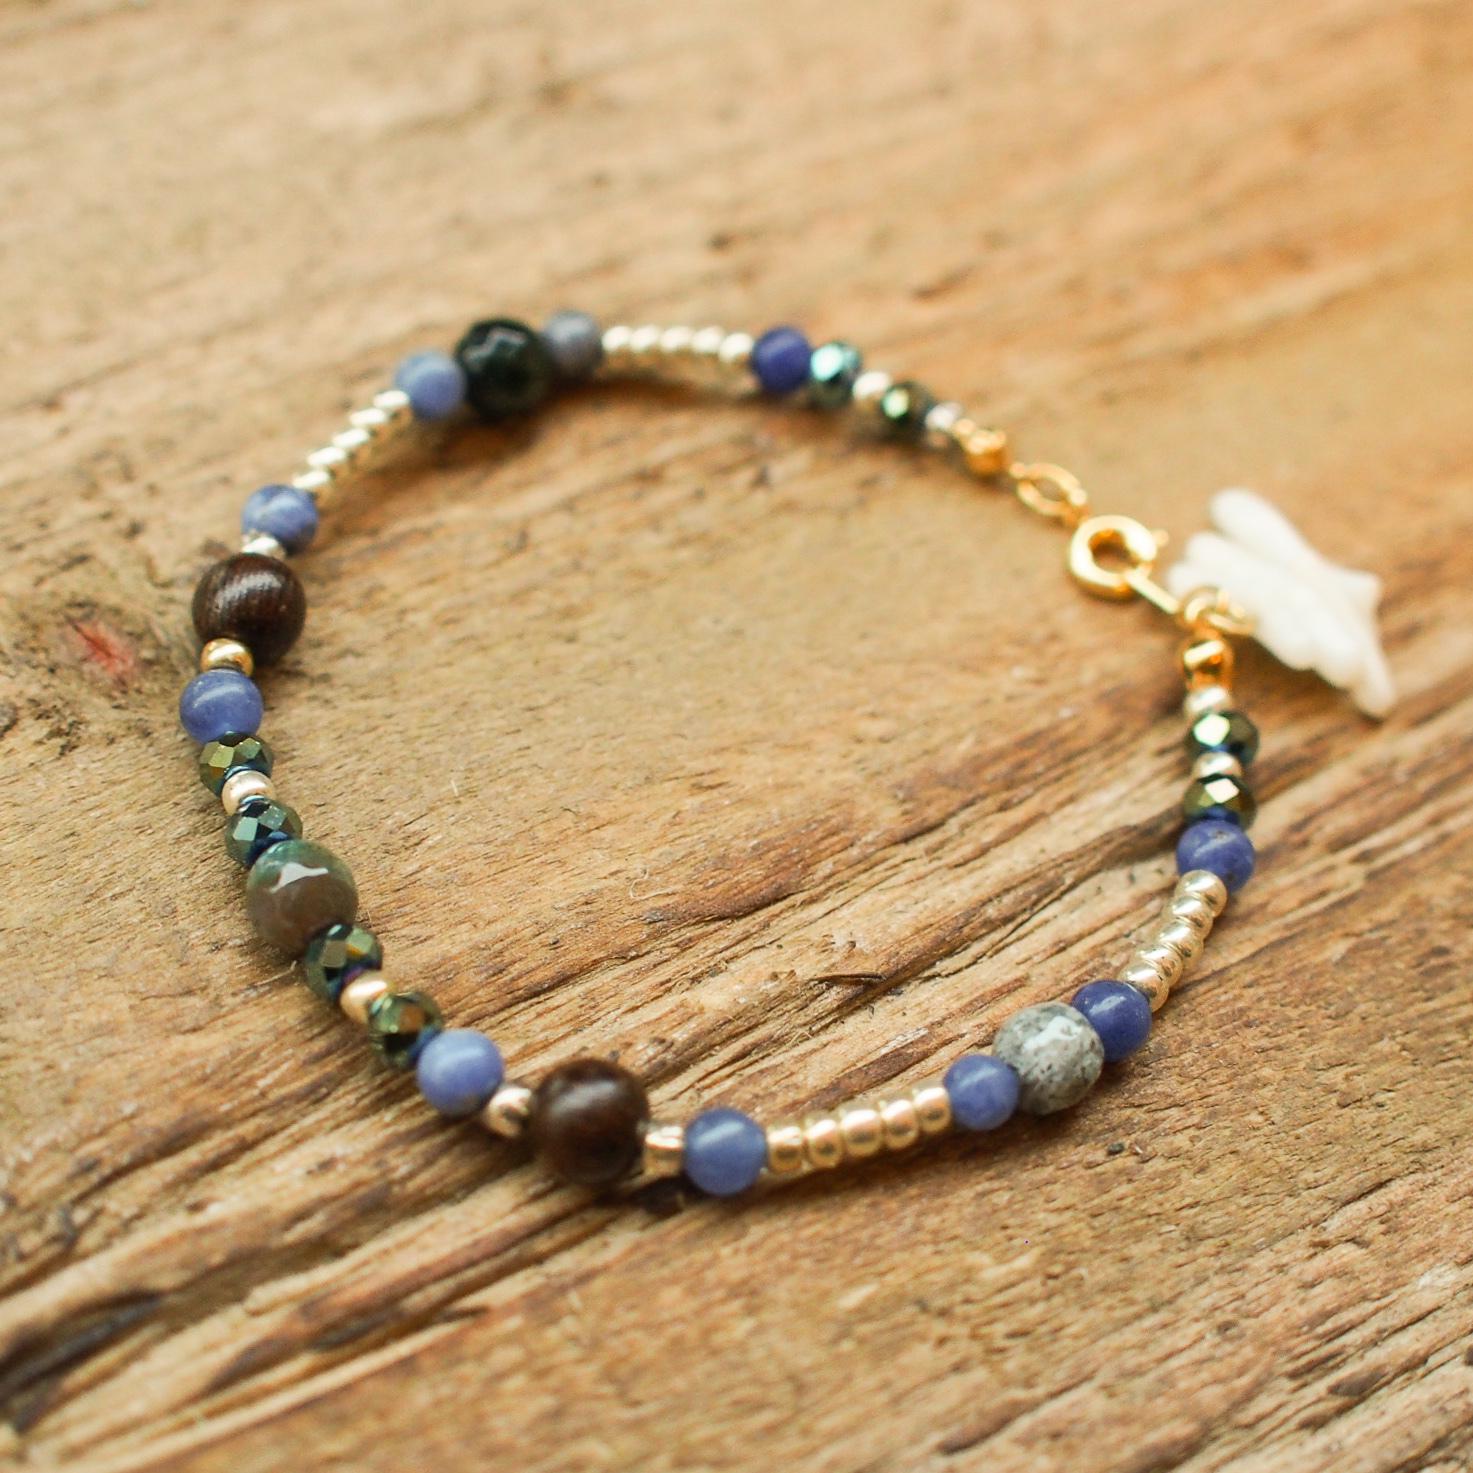 【Indian Agate】×【Sodalite】Bracelet